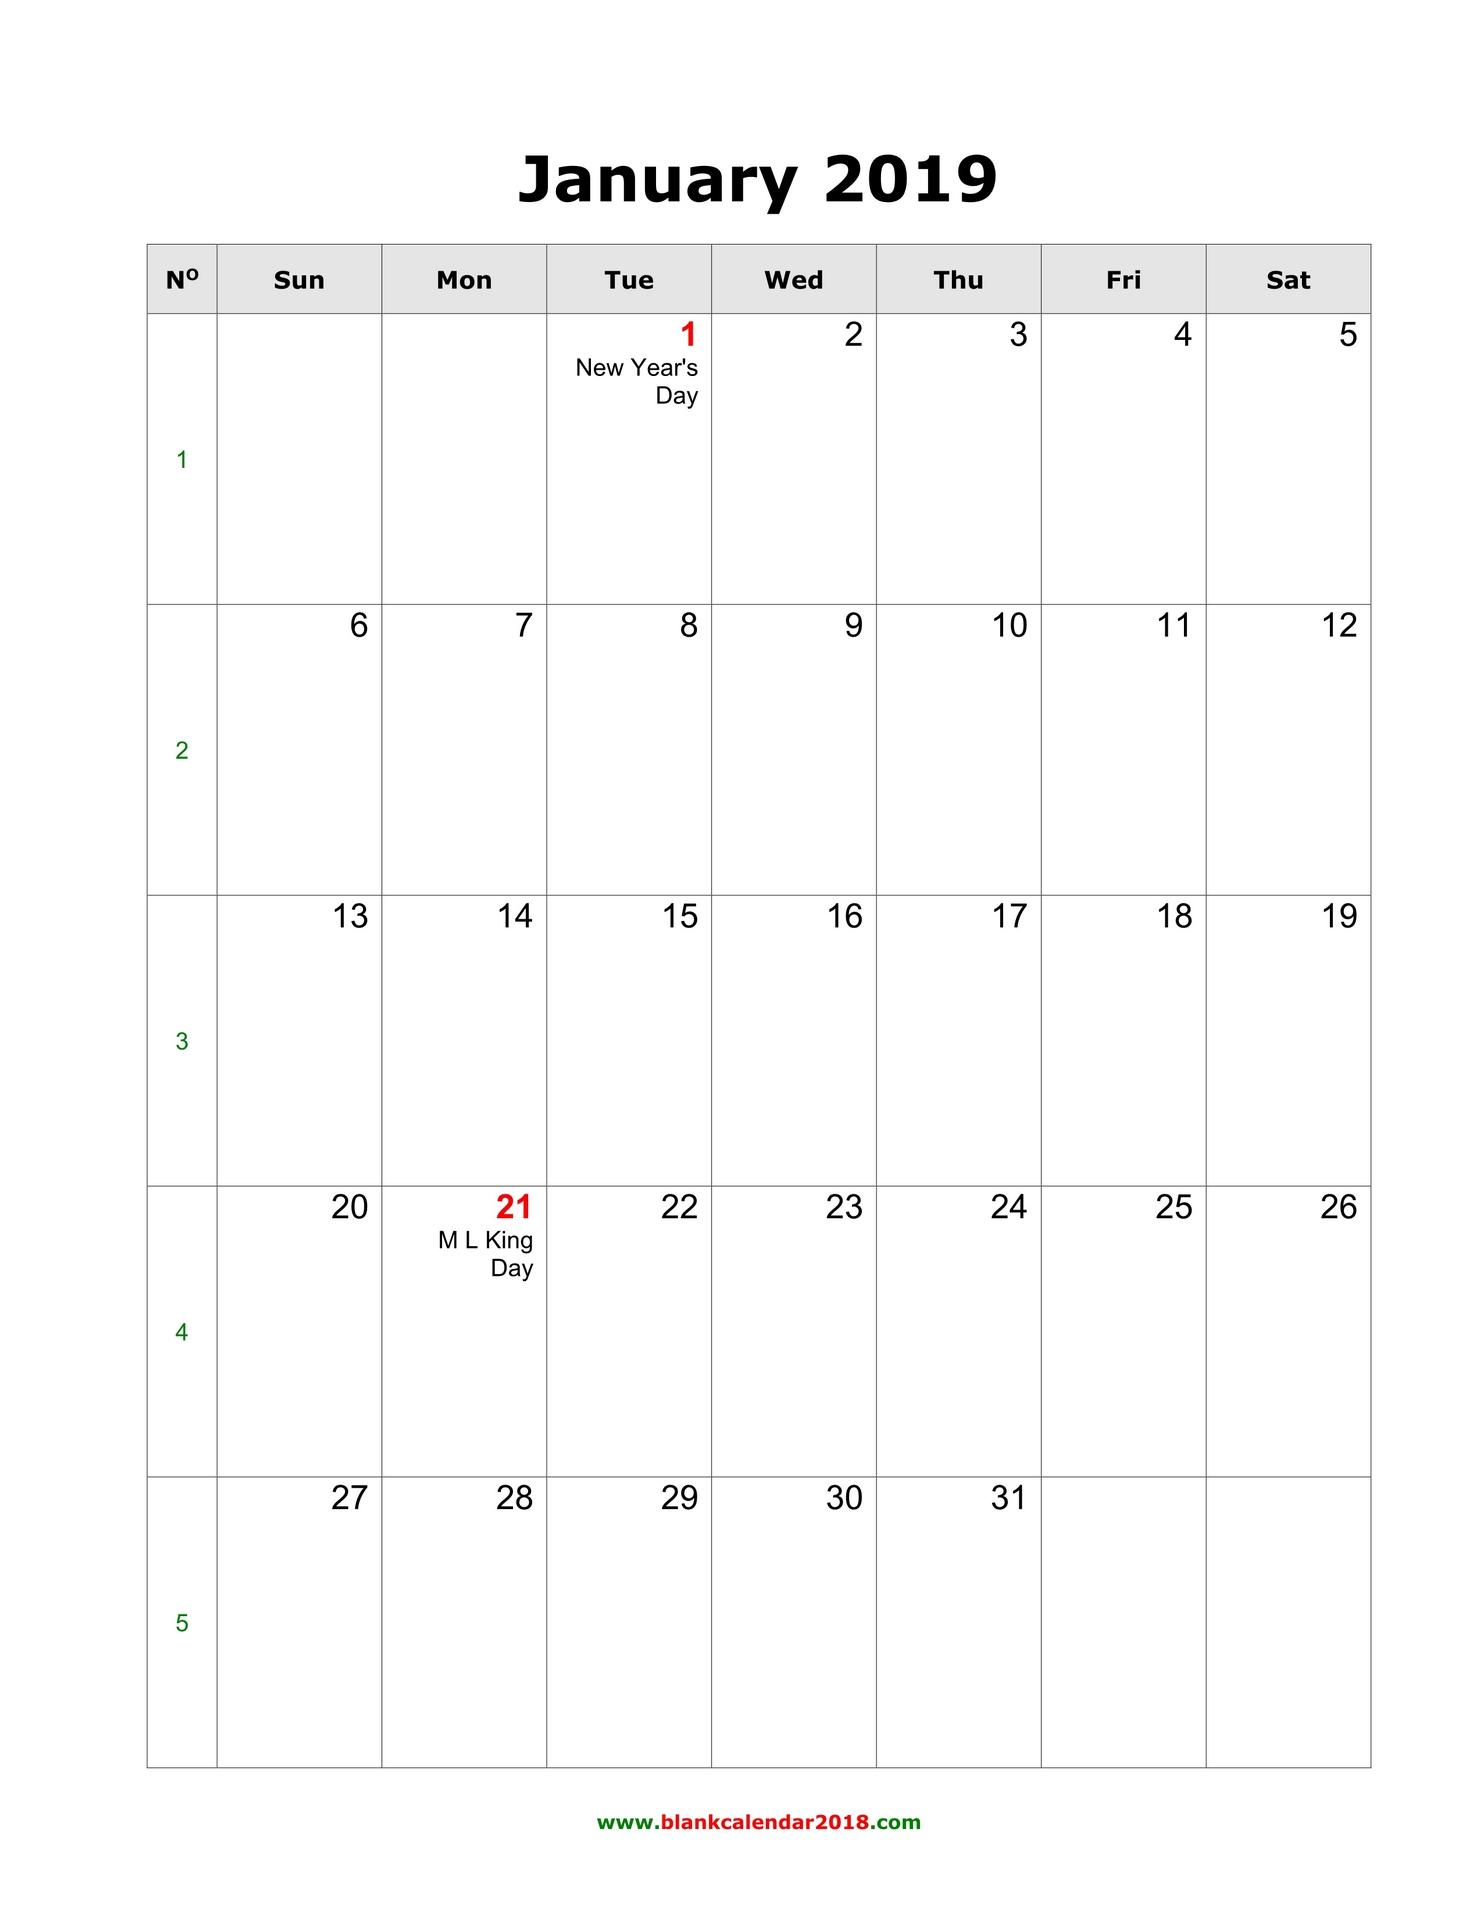 2019 Blank Monthly Calendar - Agadi.ifreezer.co